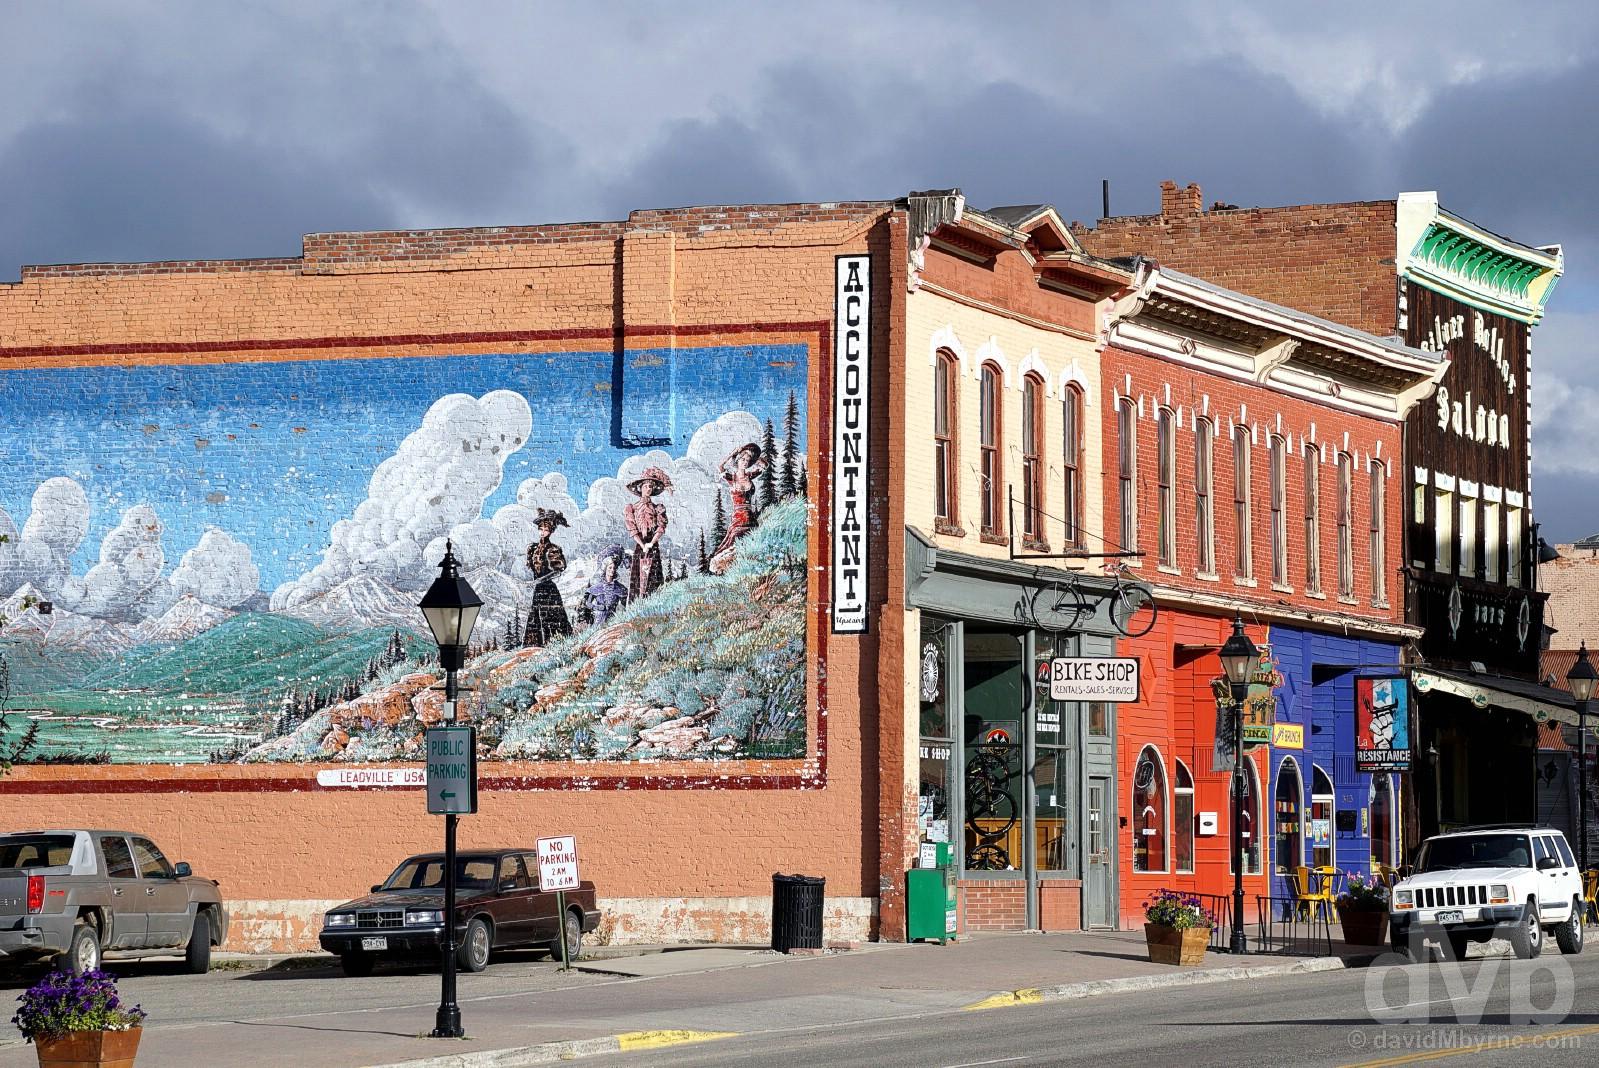 Harrison Avenue, Leadville, central Colorado, USA. September 13, 2016.